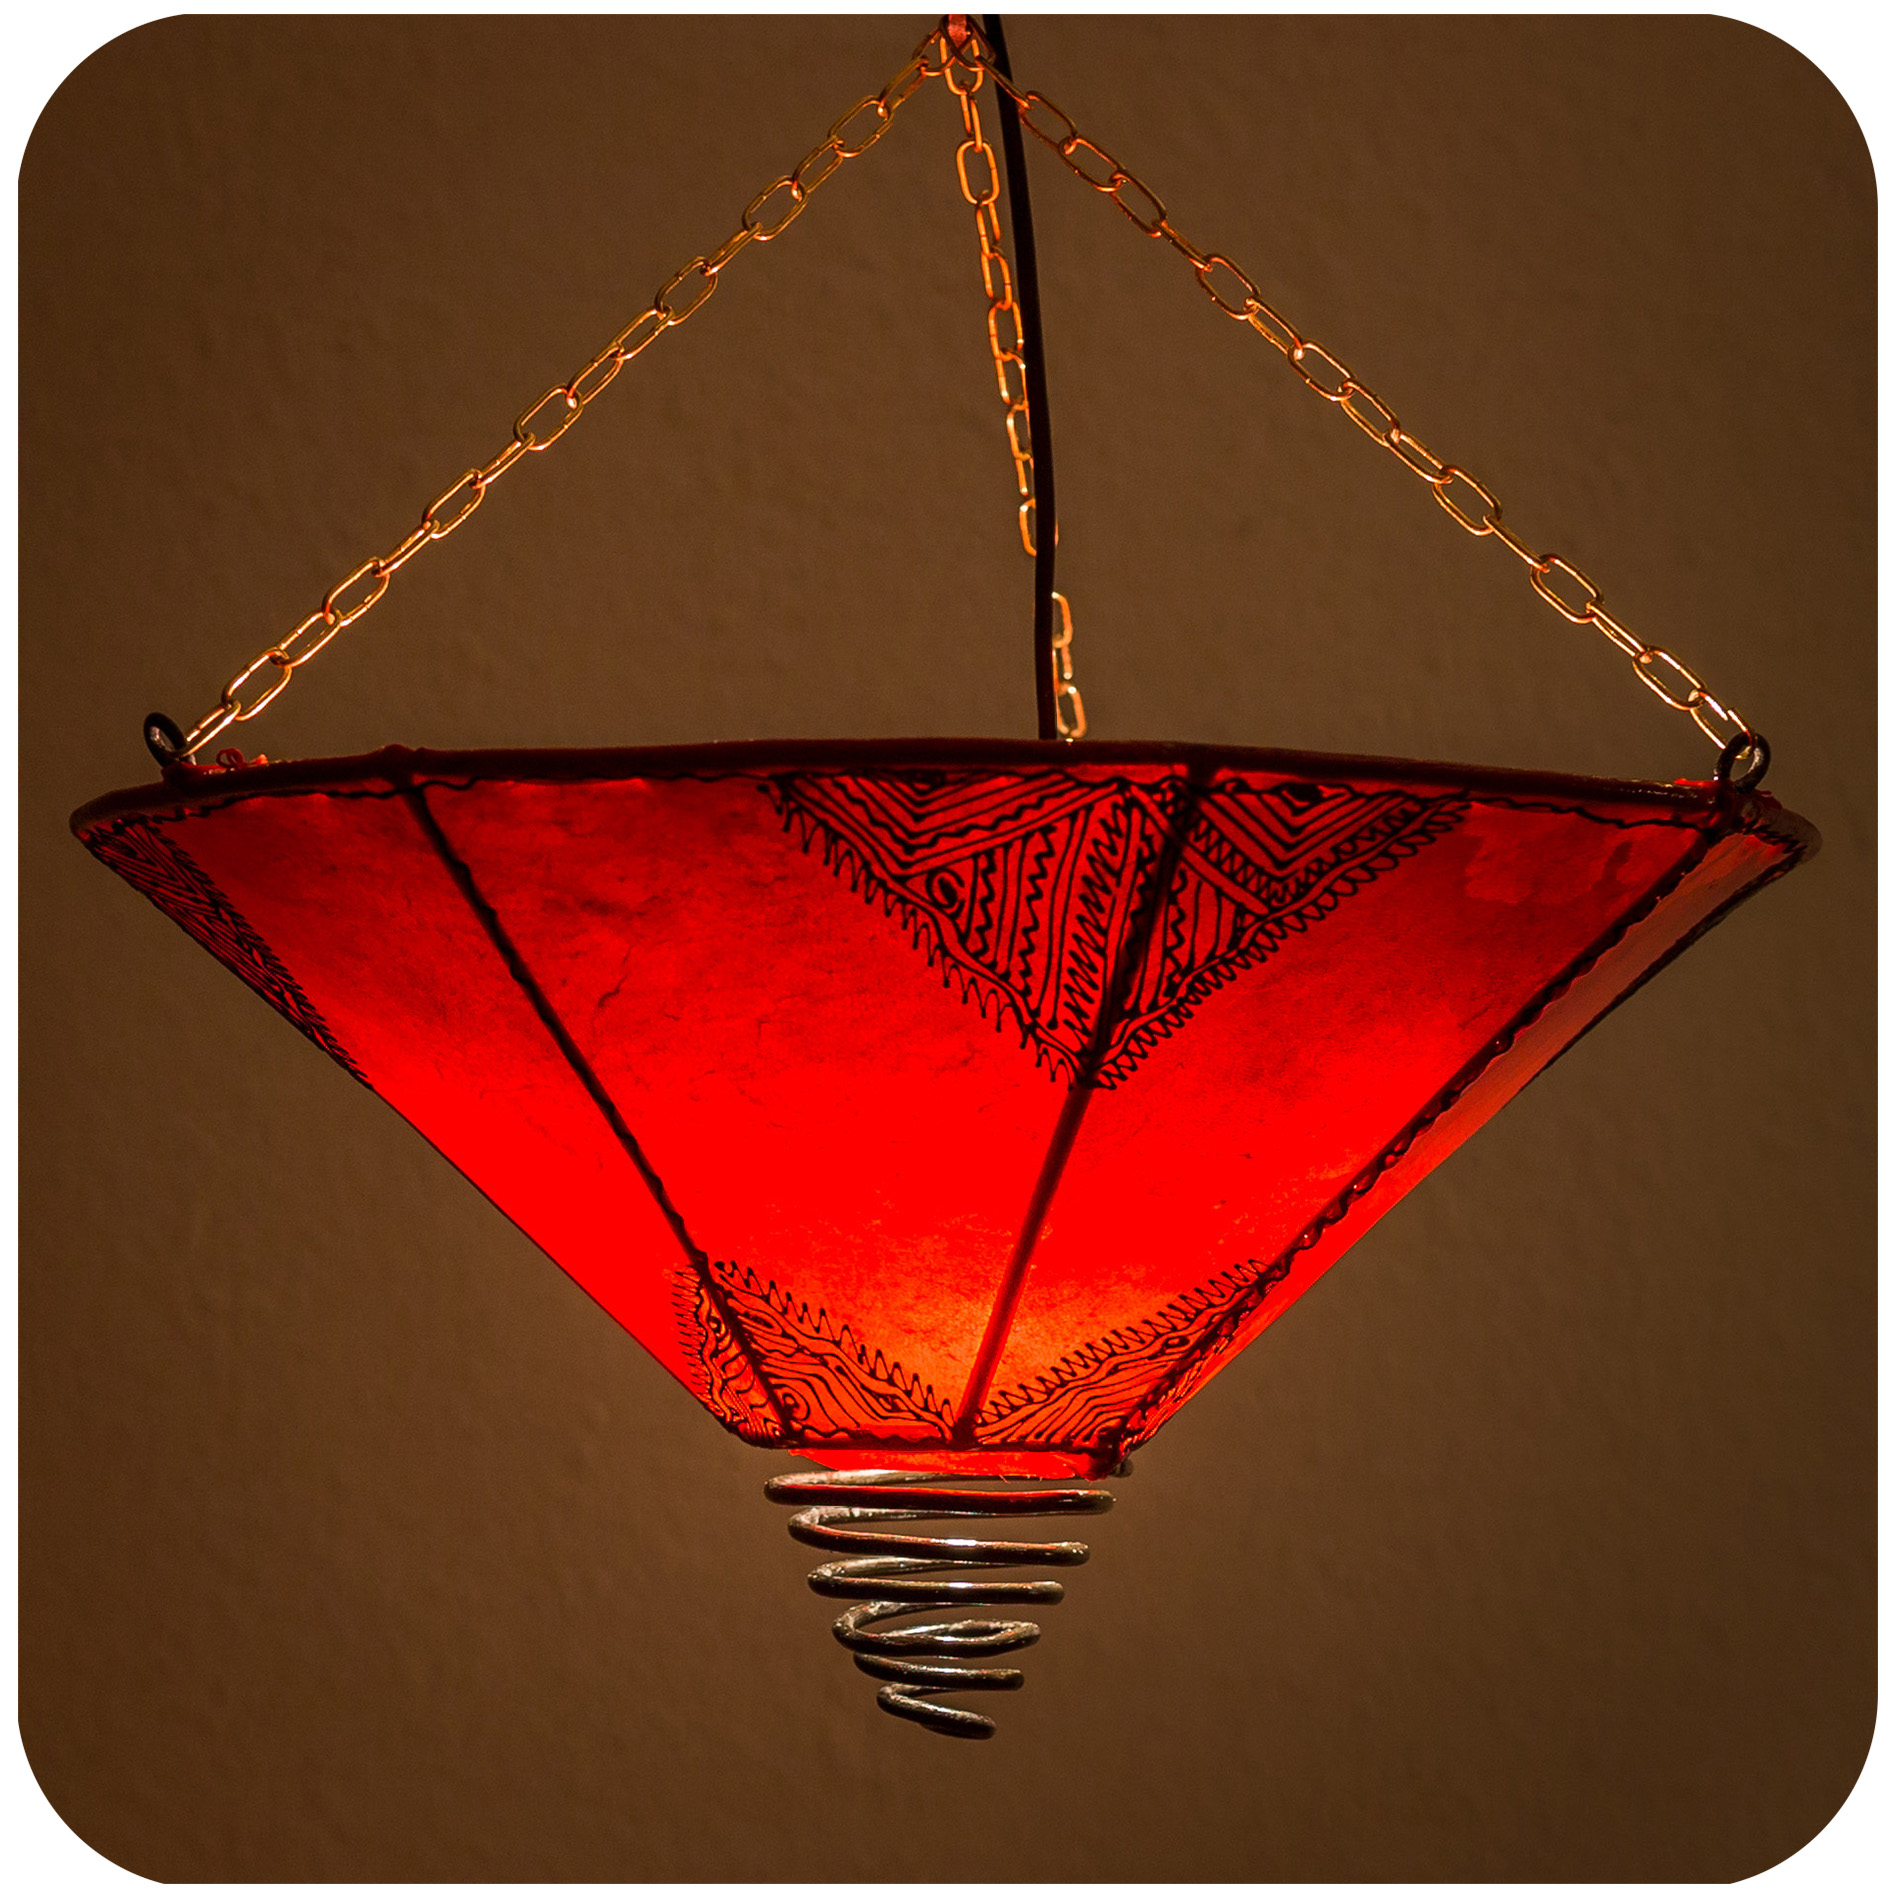 orientalische henna leder decken h nge lampenschirme. Black Bedroom Furniture Sets. Home Design Ideas